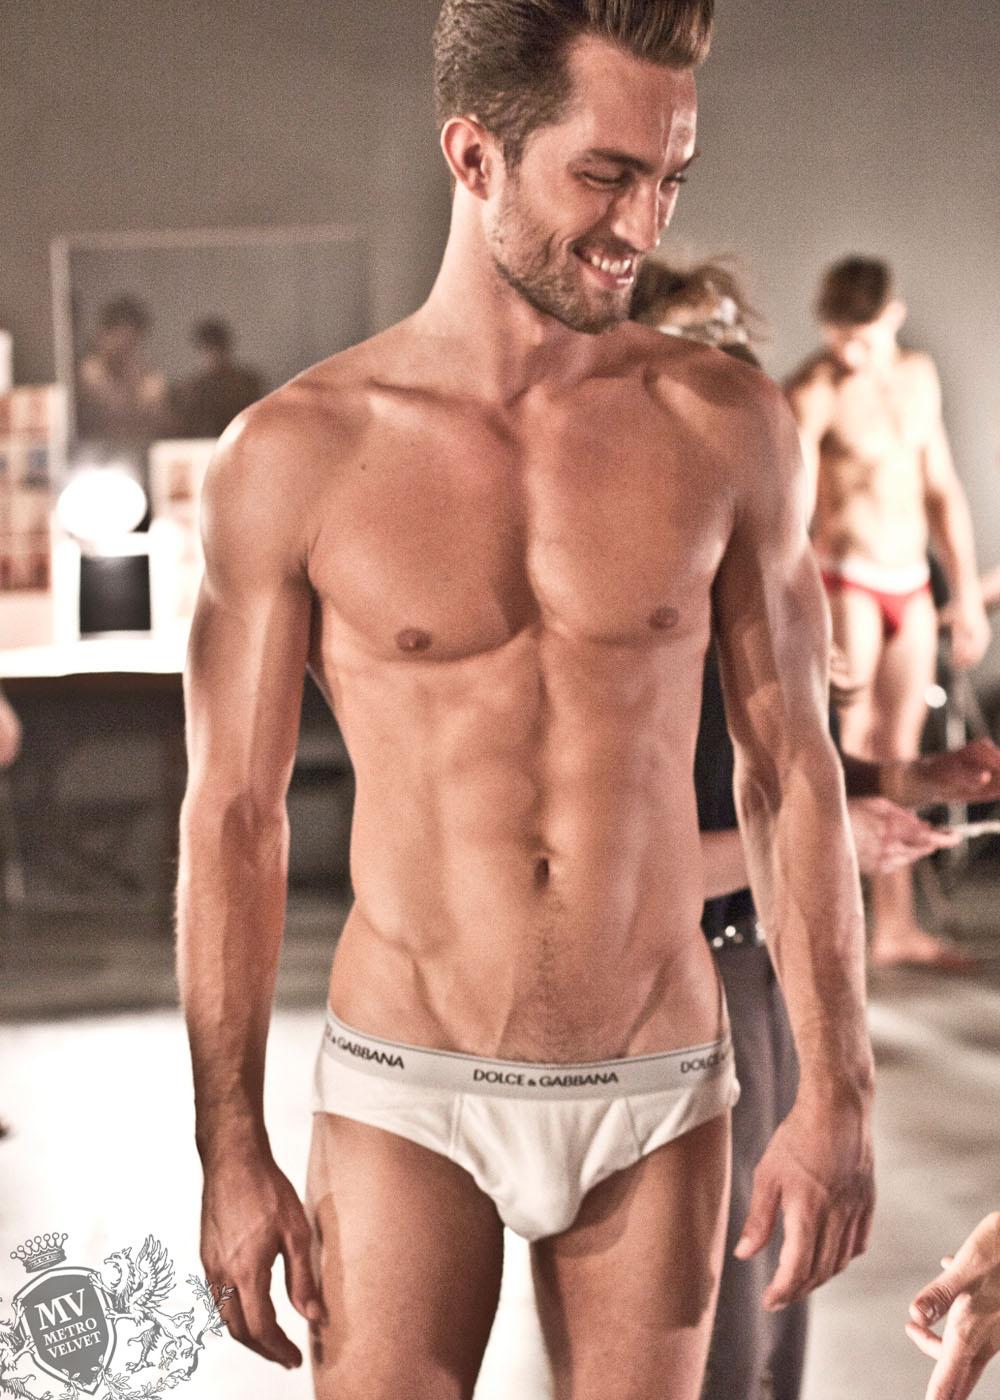 hot gay body